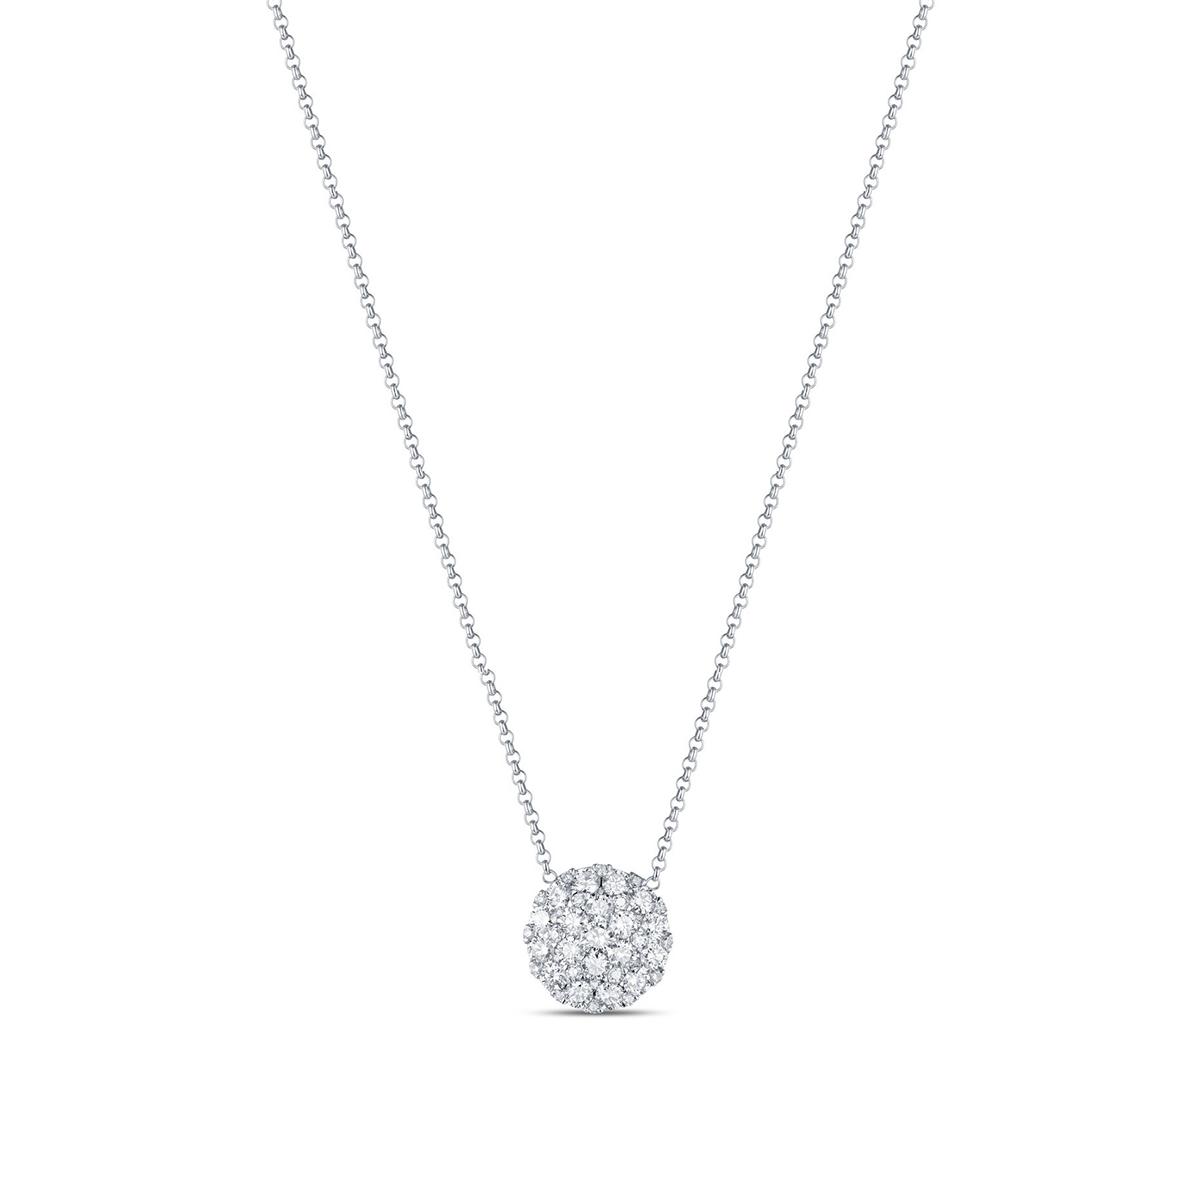 round-diamond-paved-necklace-14kwgold